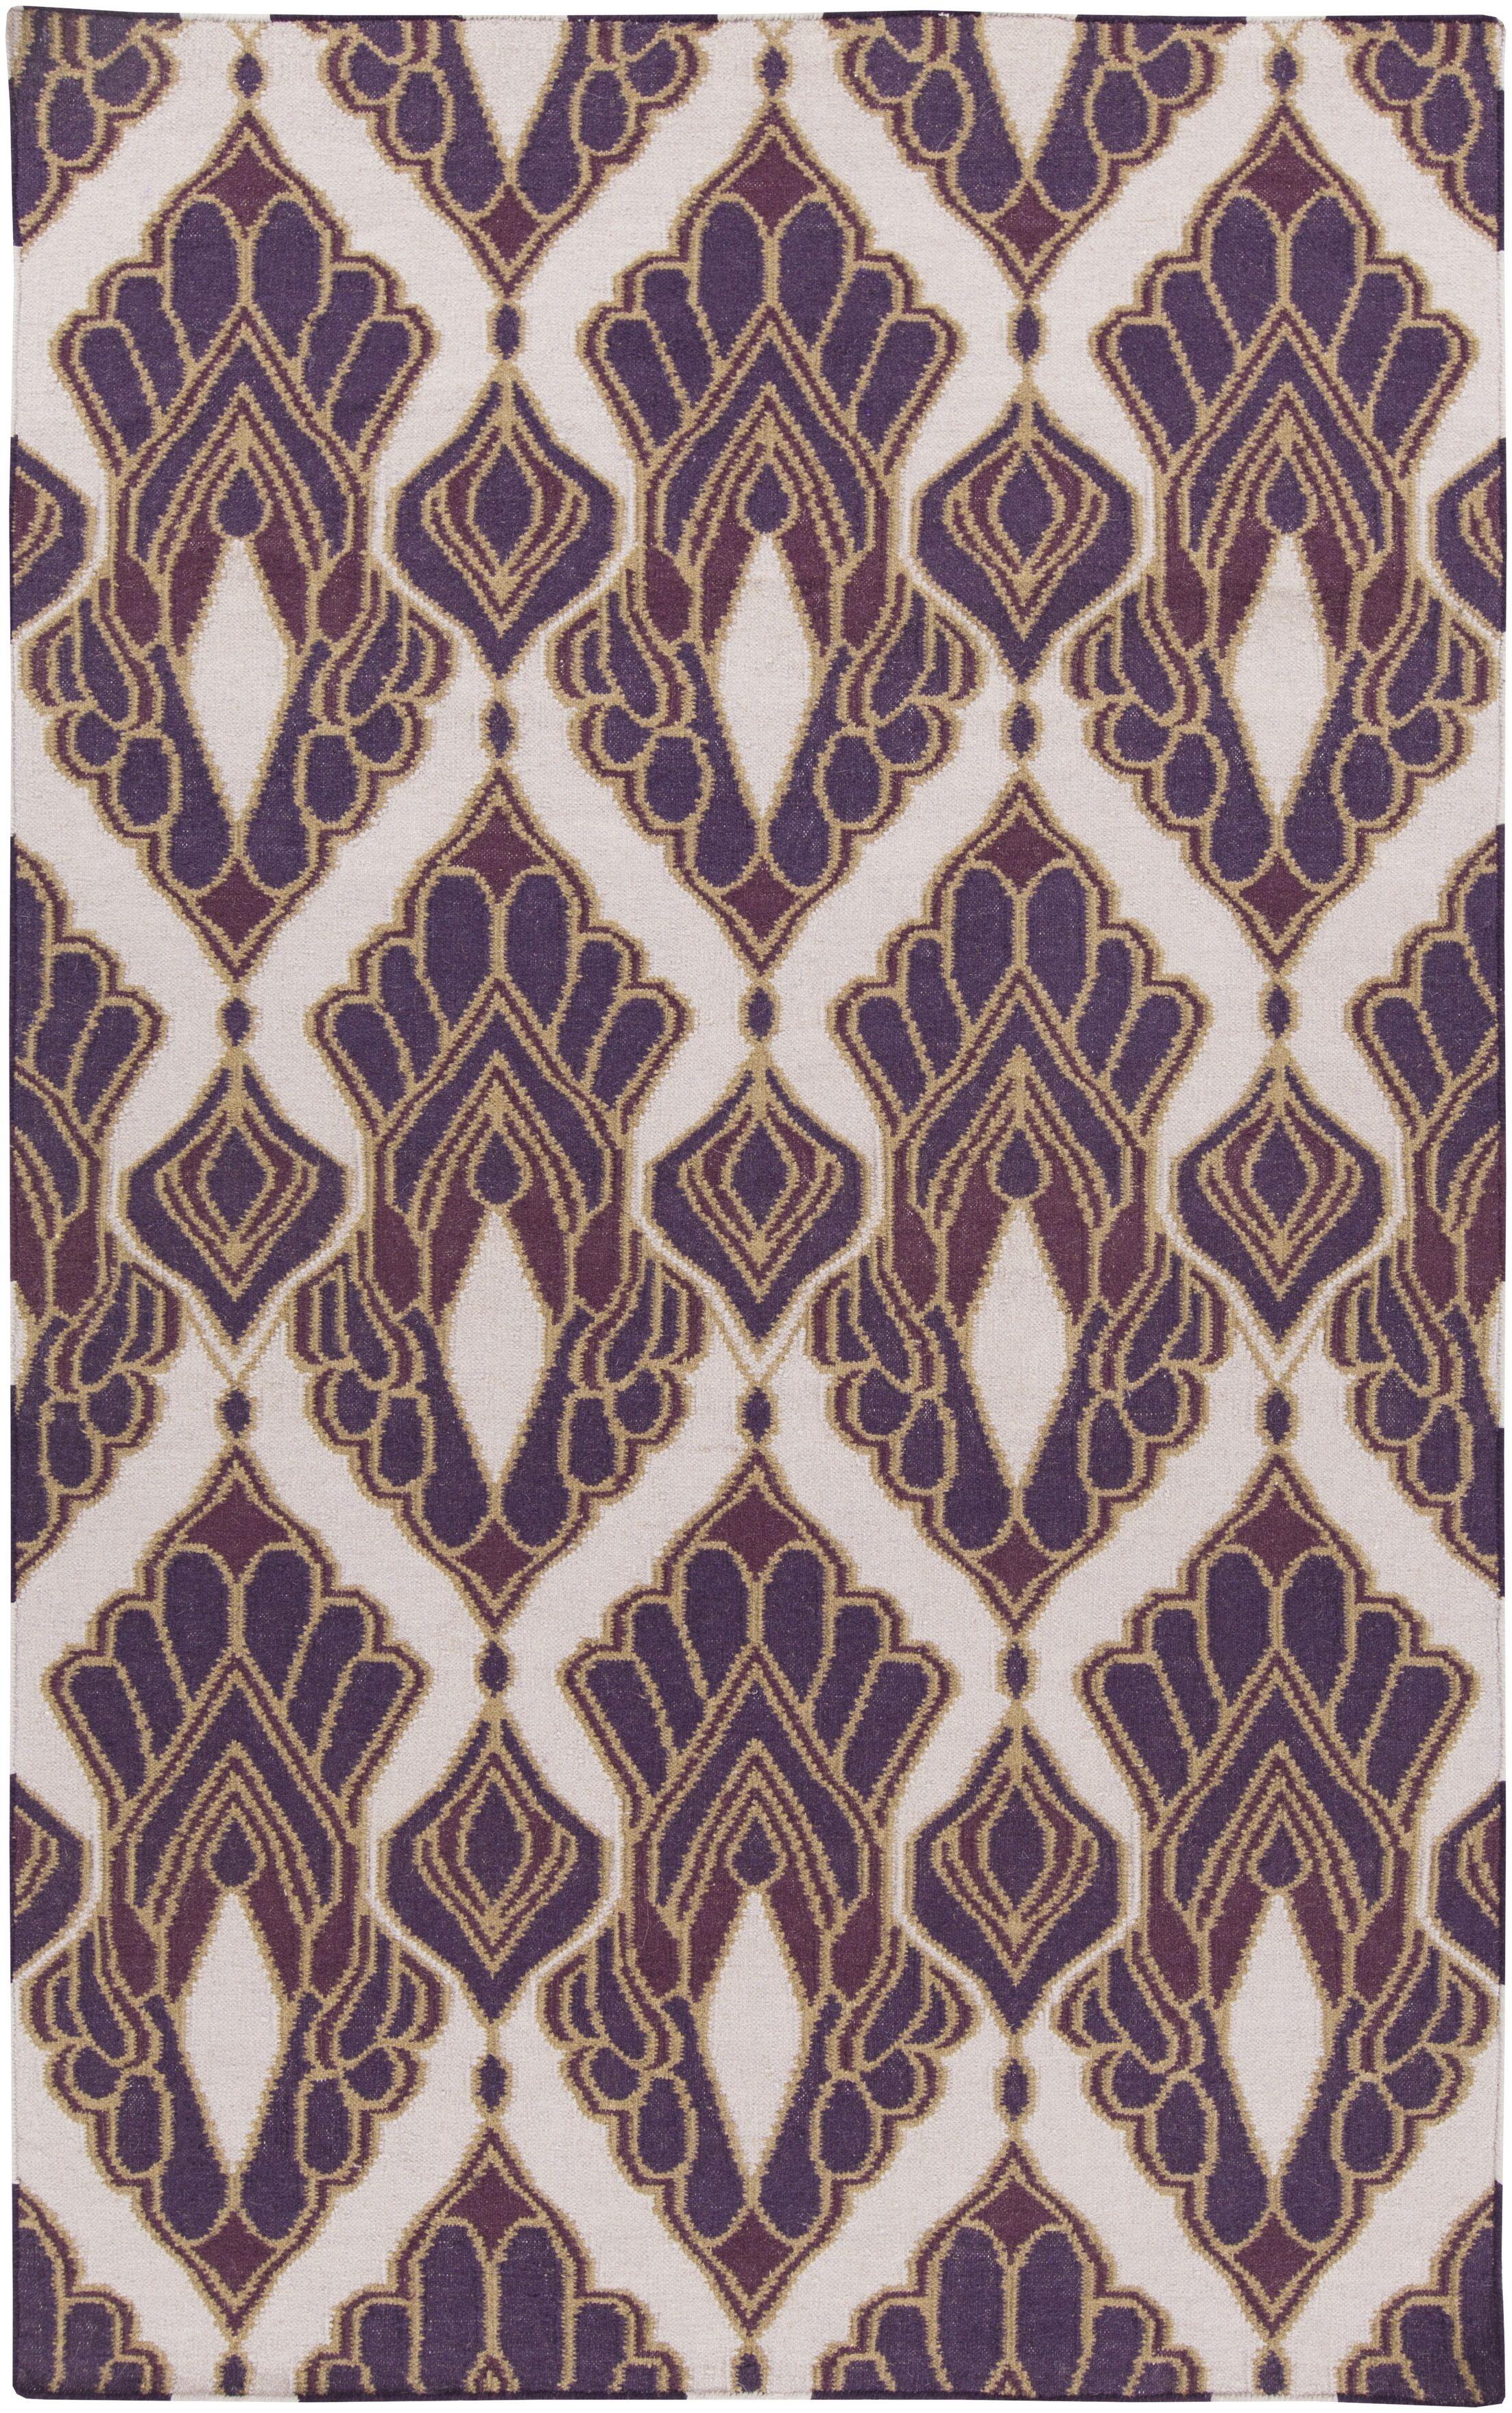 Voyages Violet Ikat/Suzani Area Rug Rug Size: Rectangle 2' x 3'